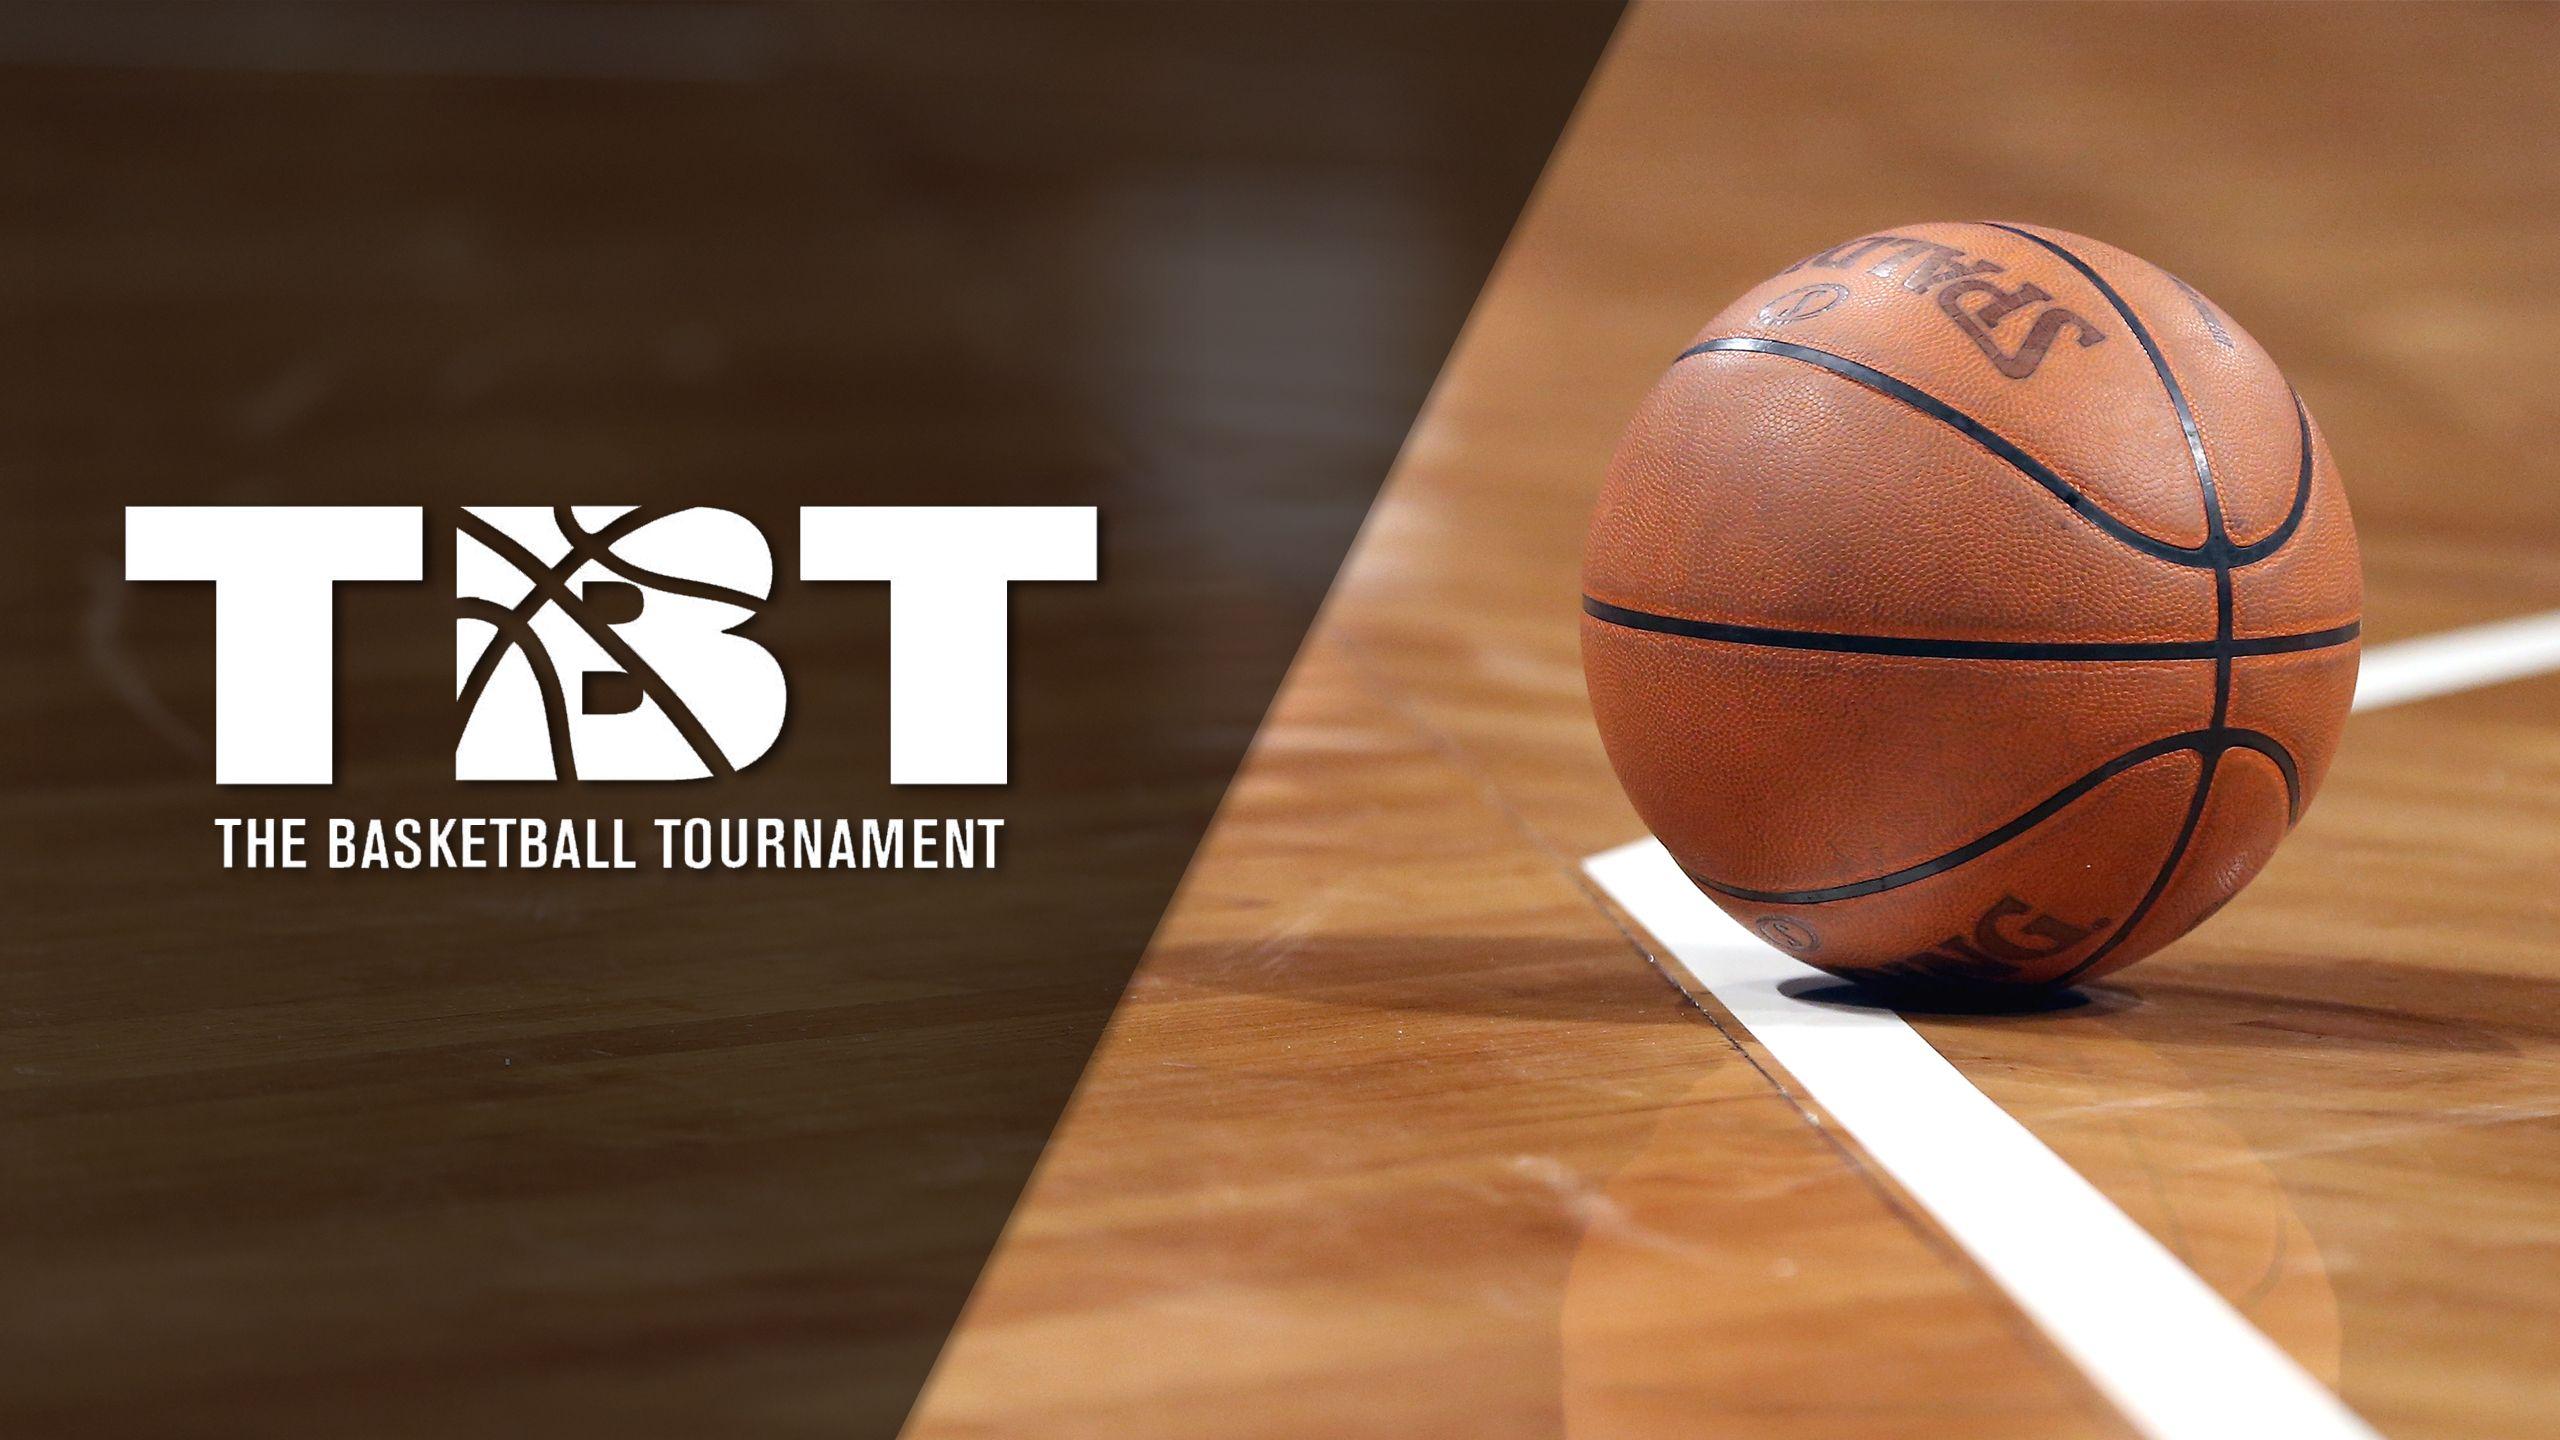 Matadors (Texas Tech Alumni) vs. Scarlet & Gray (Ohio State Alumni) (Regional Round)